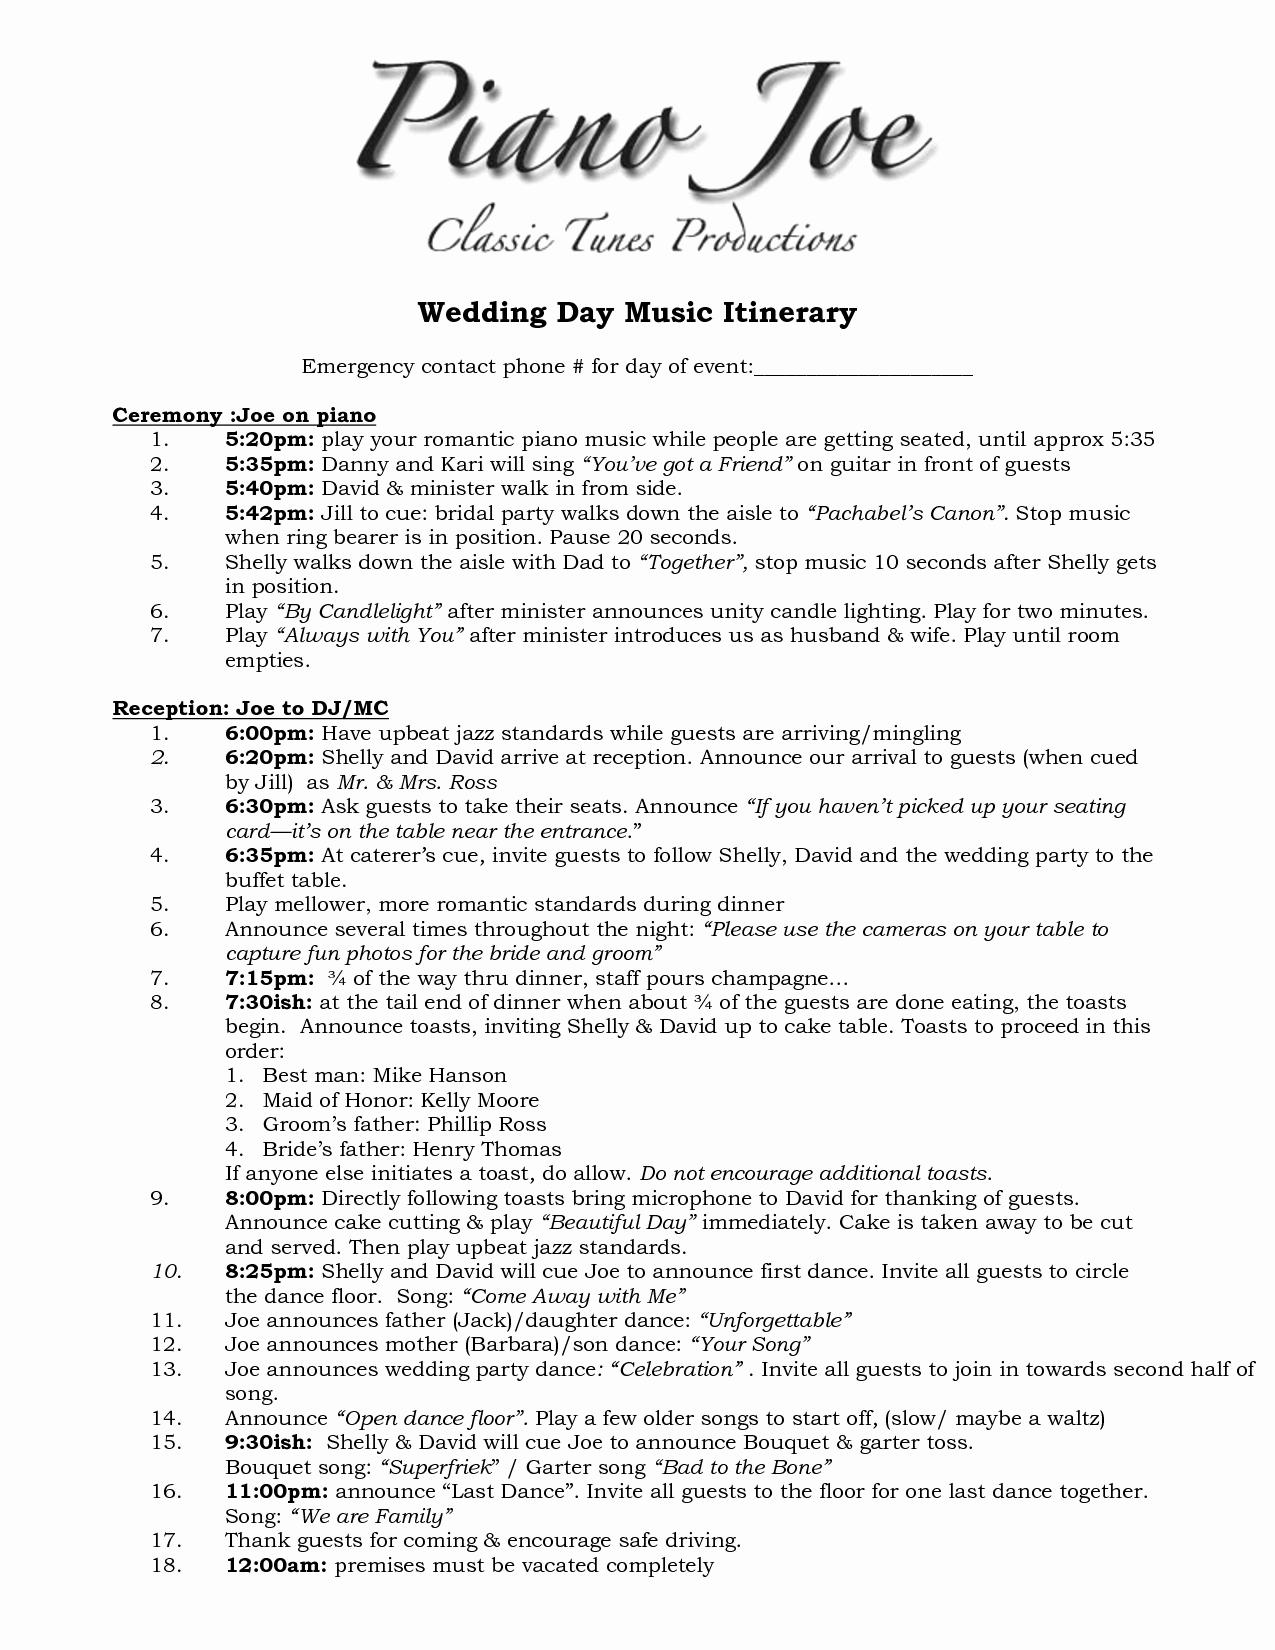 Free Wedding Itinerary Templates Luxury Wedding Itinerary Templates Free 1275px